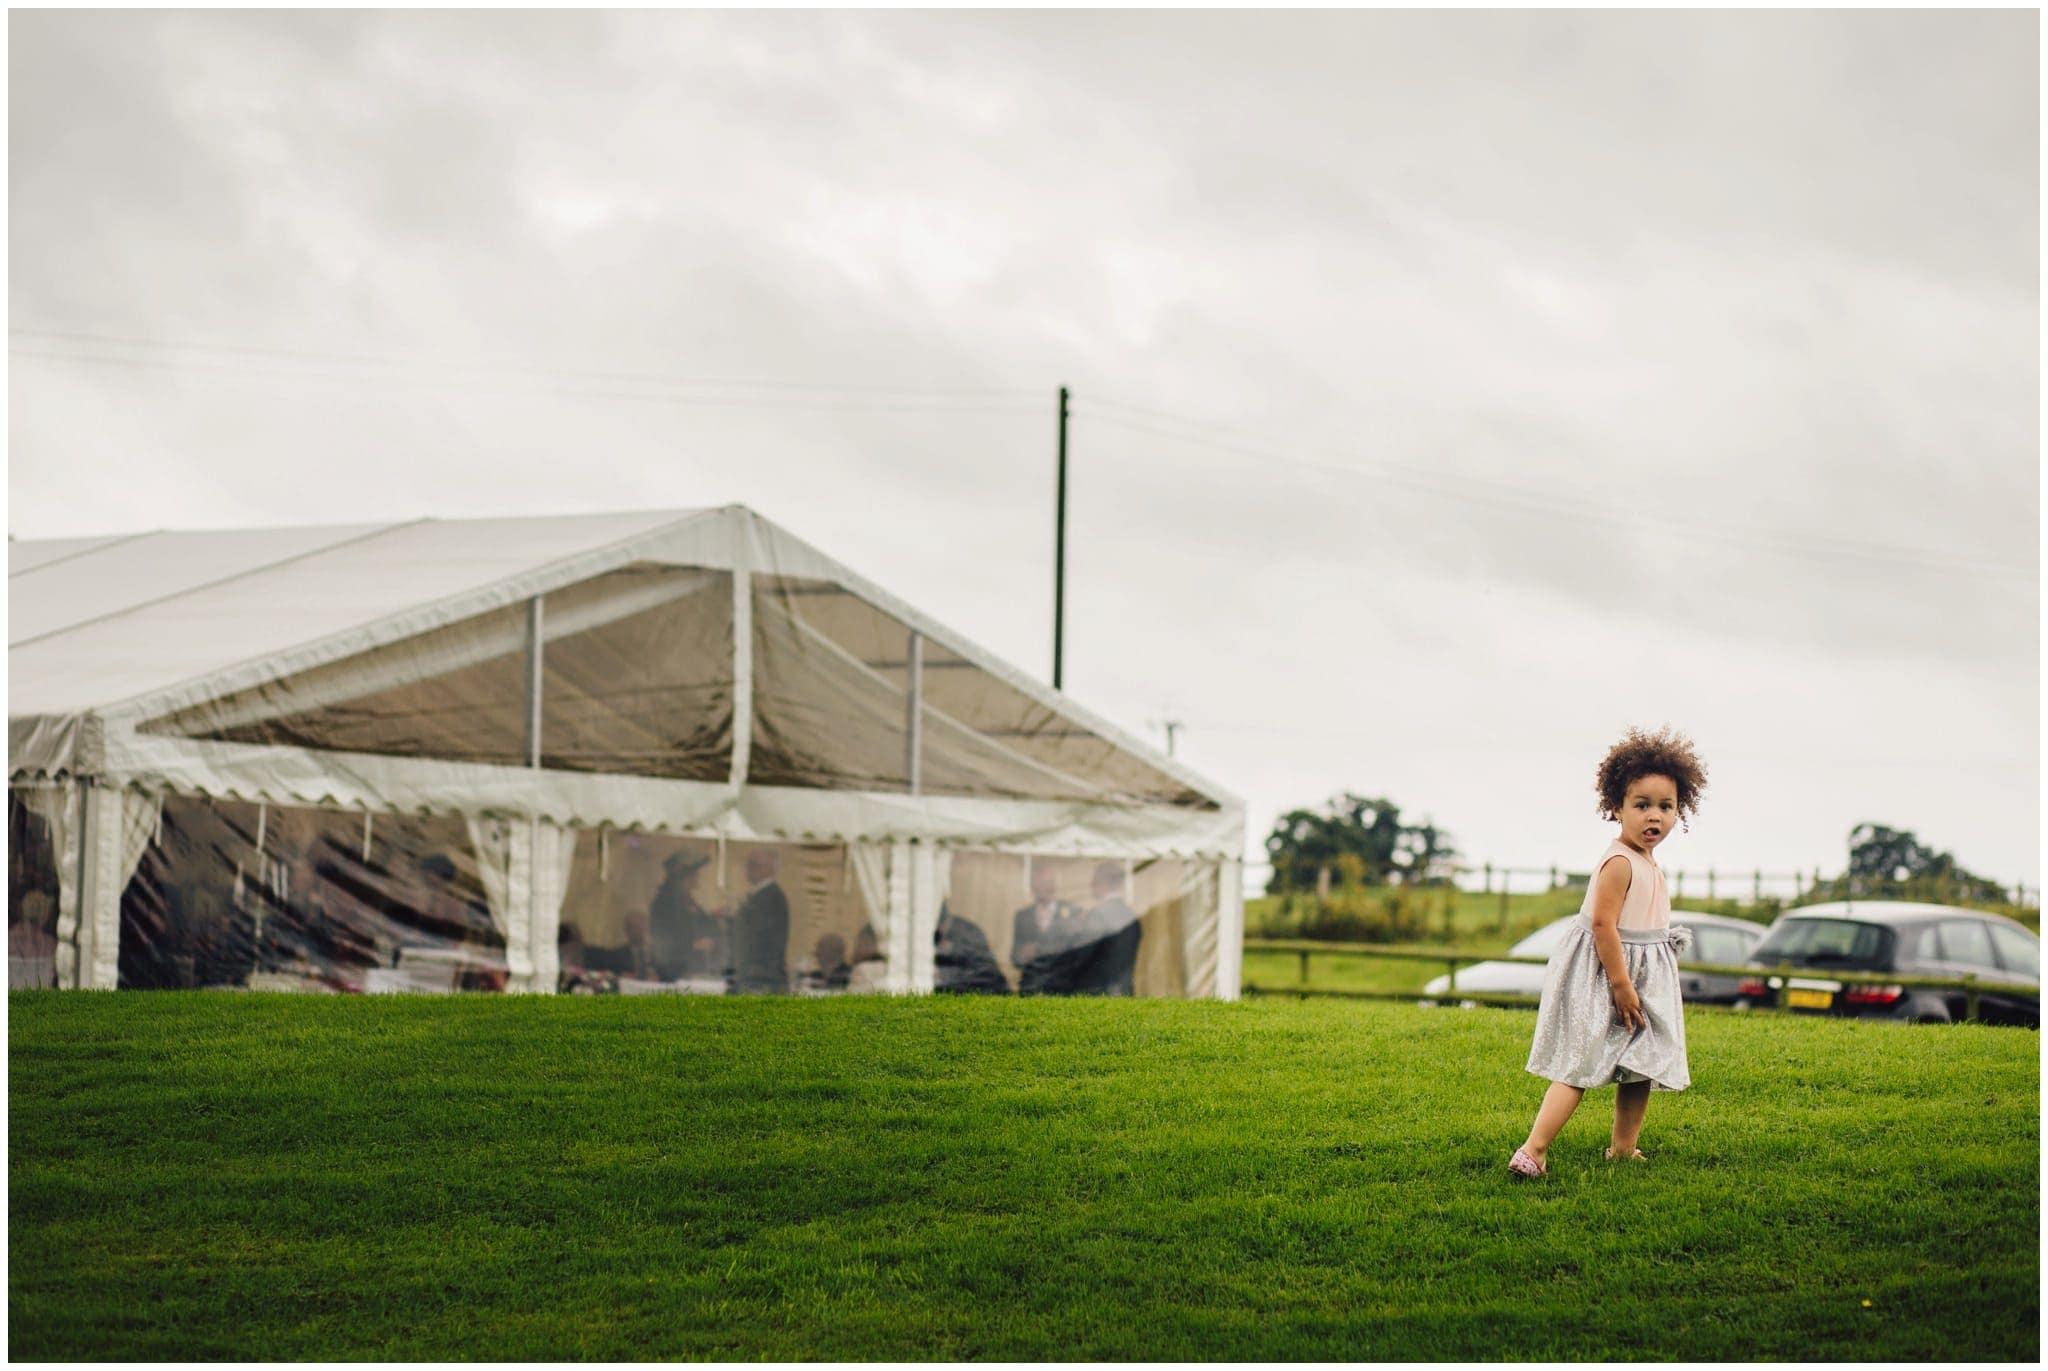 blithfield-lakeside-barns-wedding-photographer-beckythomas-400